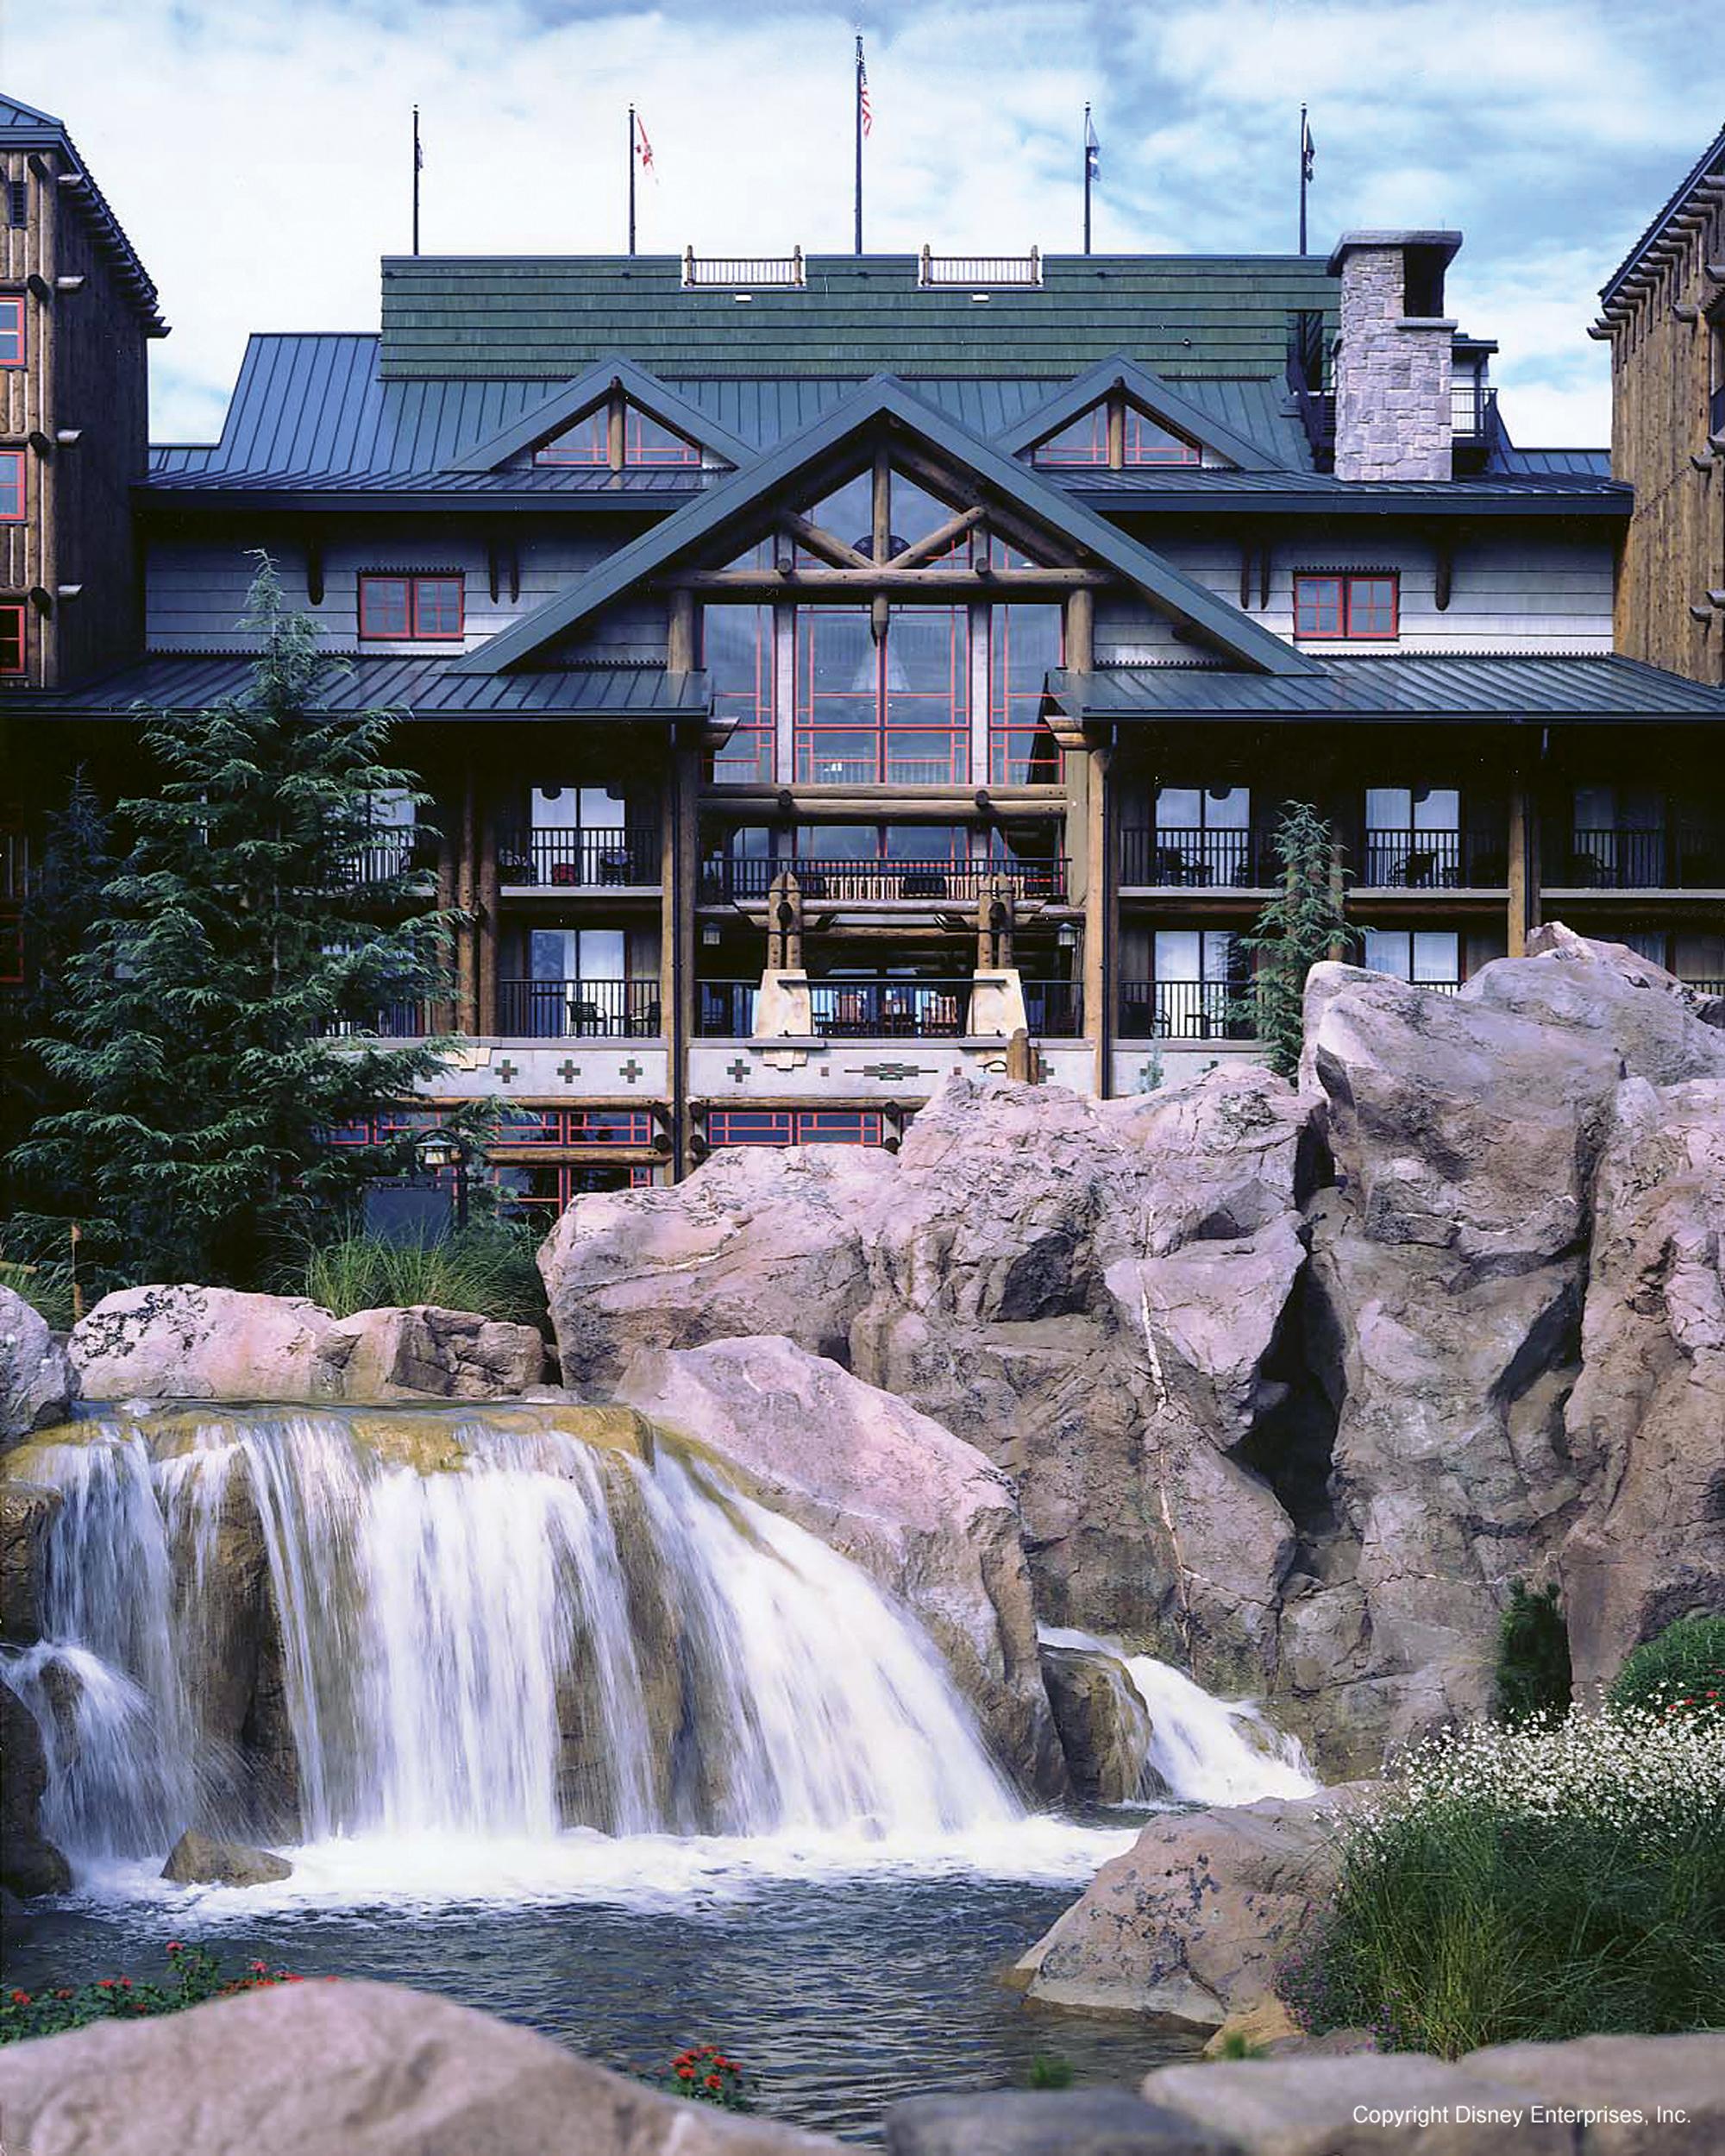 disney_wilderness_lodge_anaheim_florida_water_waterfall.jpg